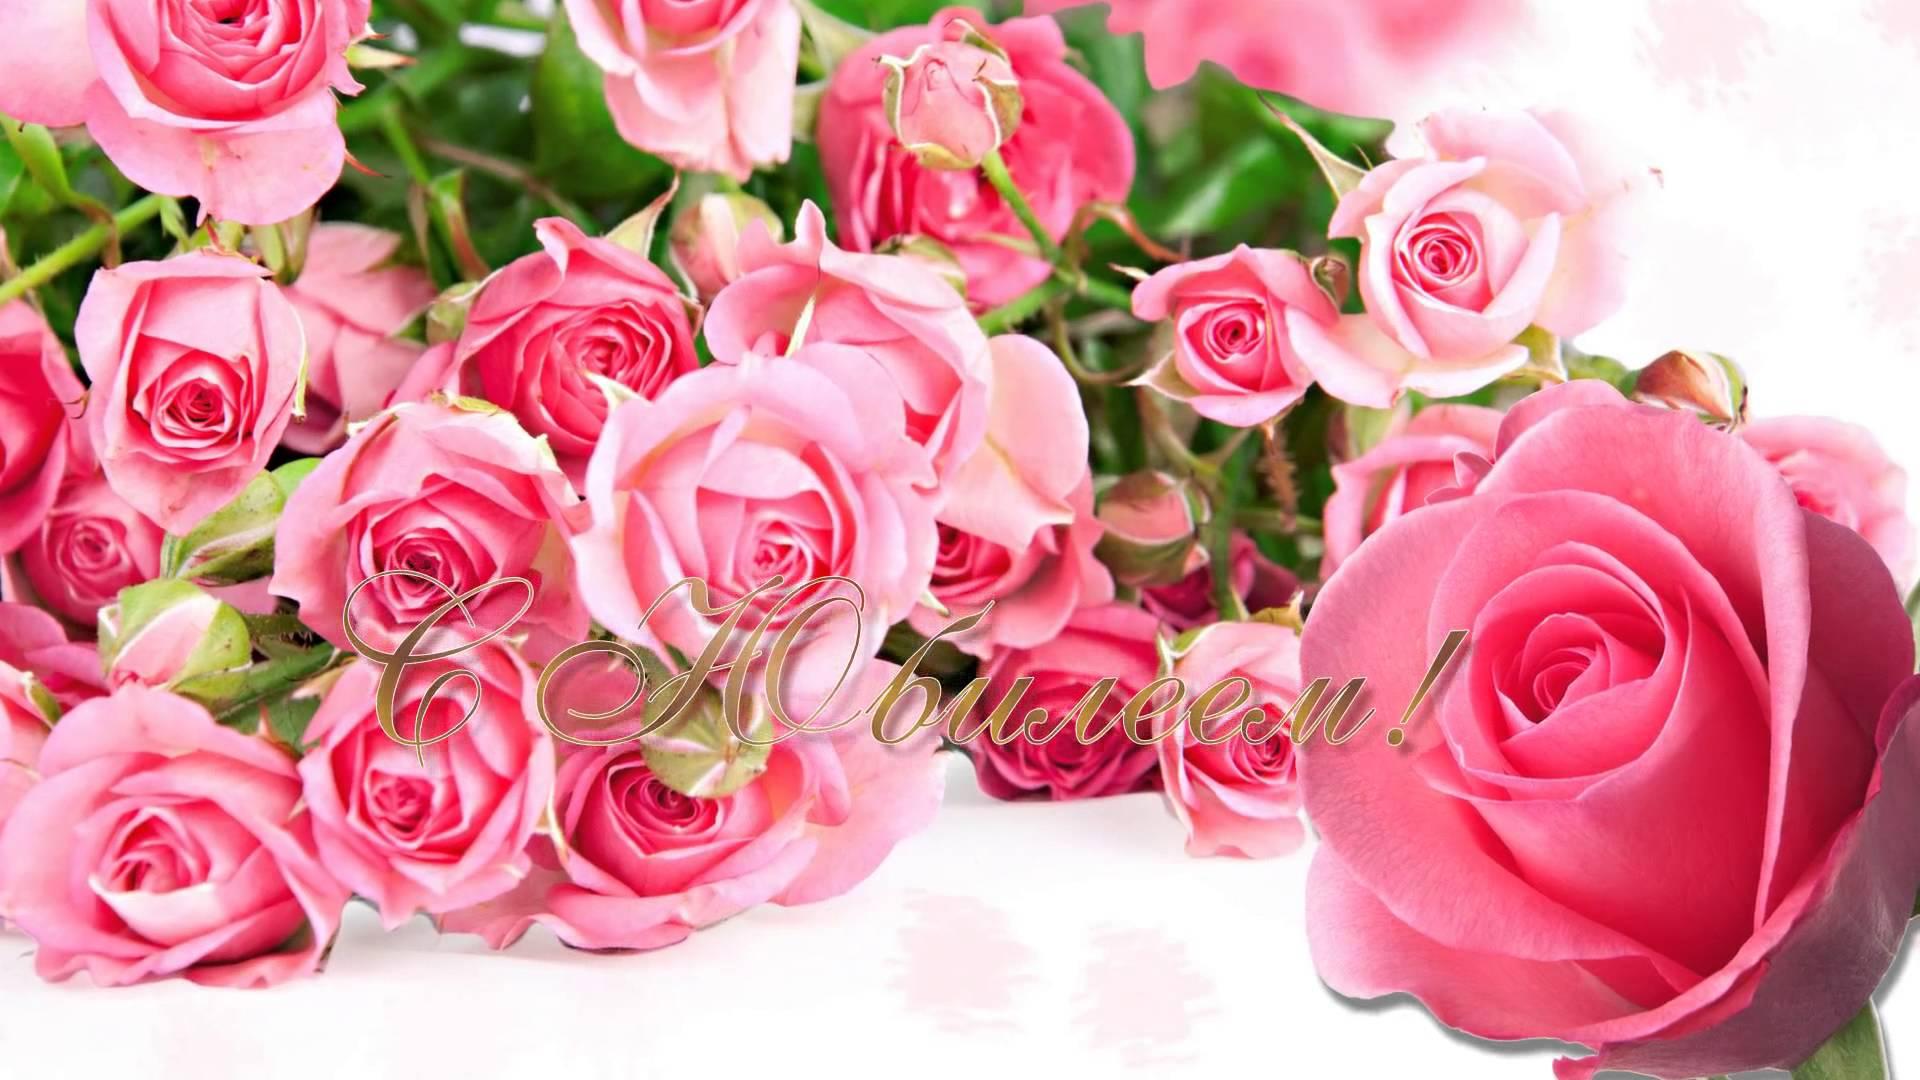 Фразочки картинках, фото открытки цветы юбилей